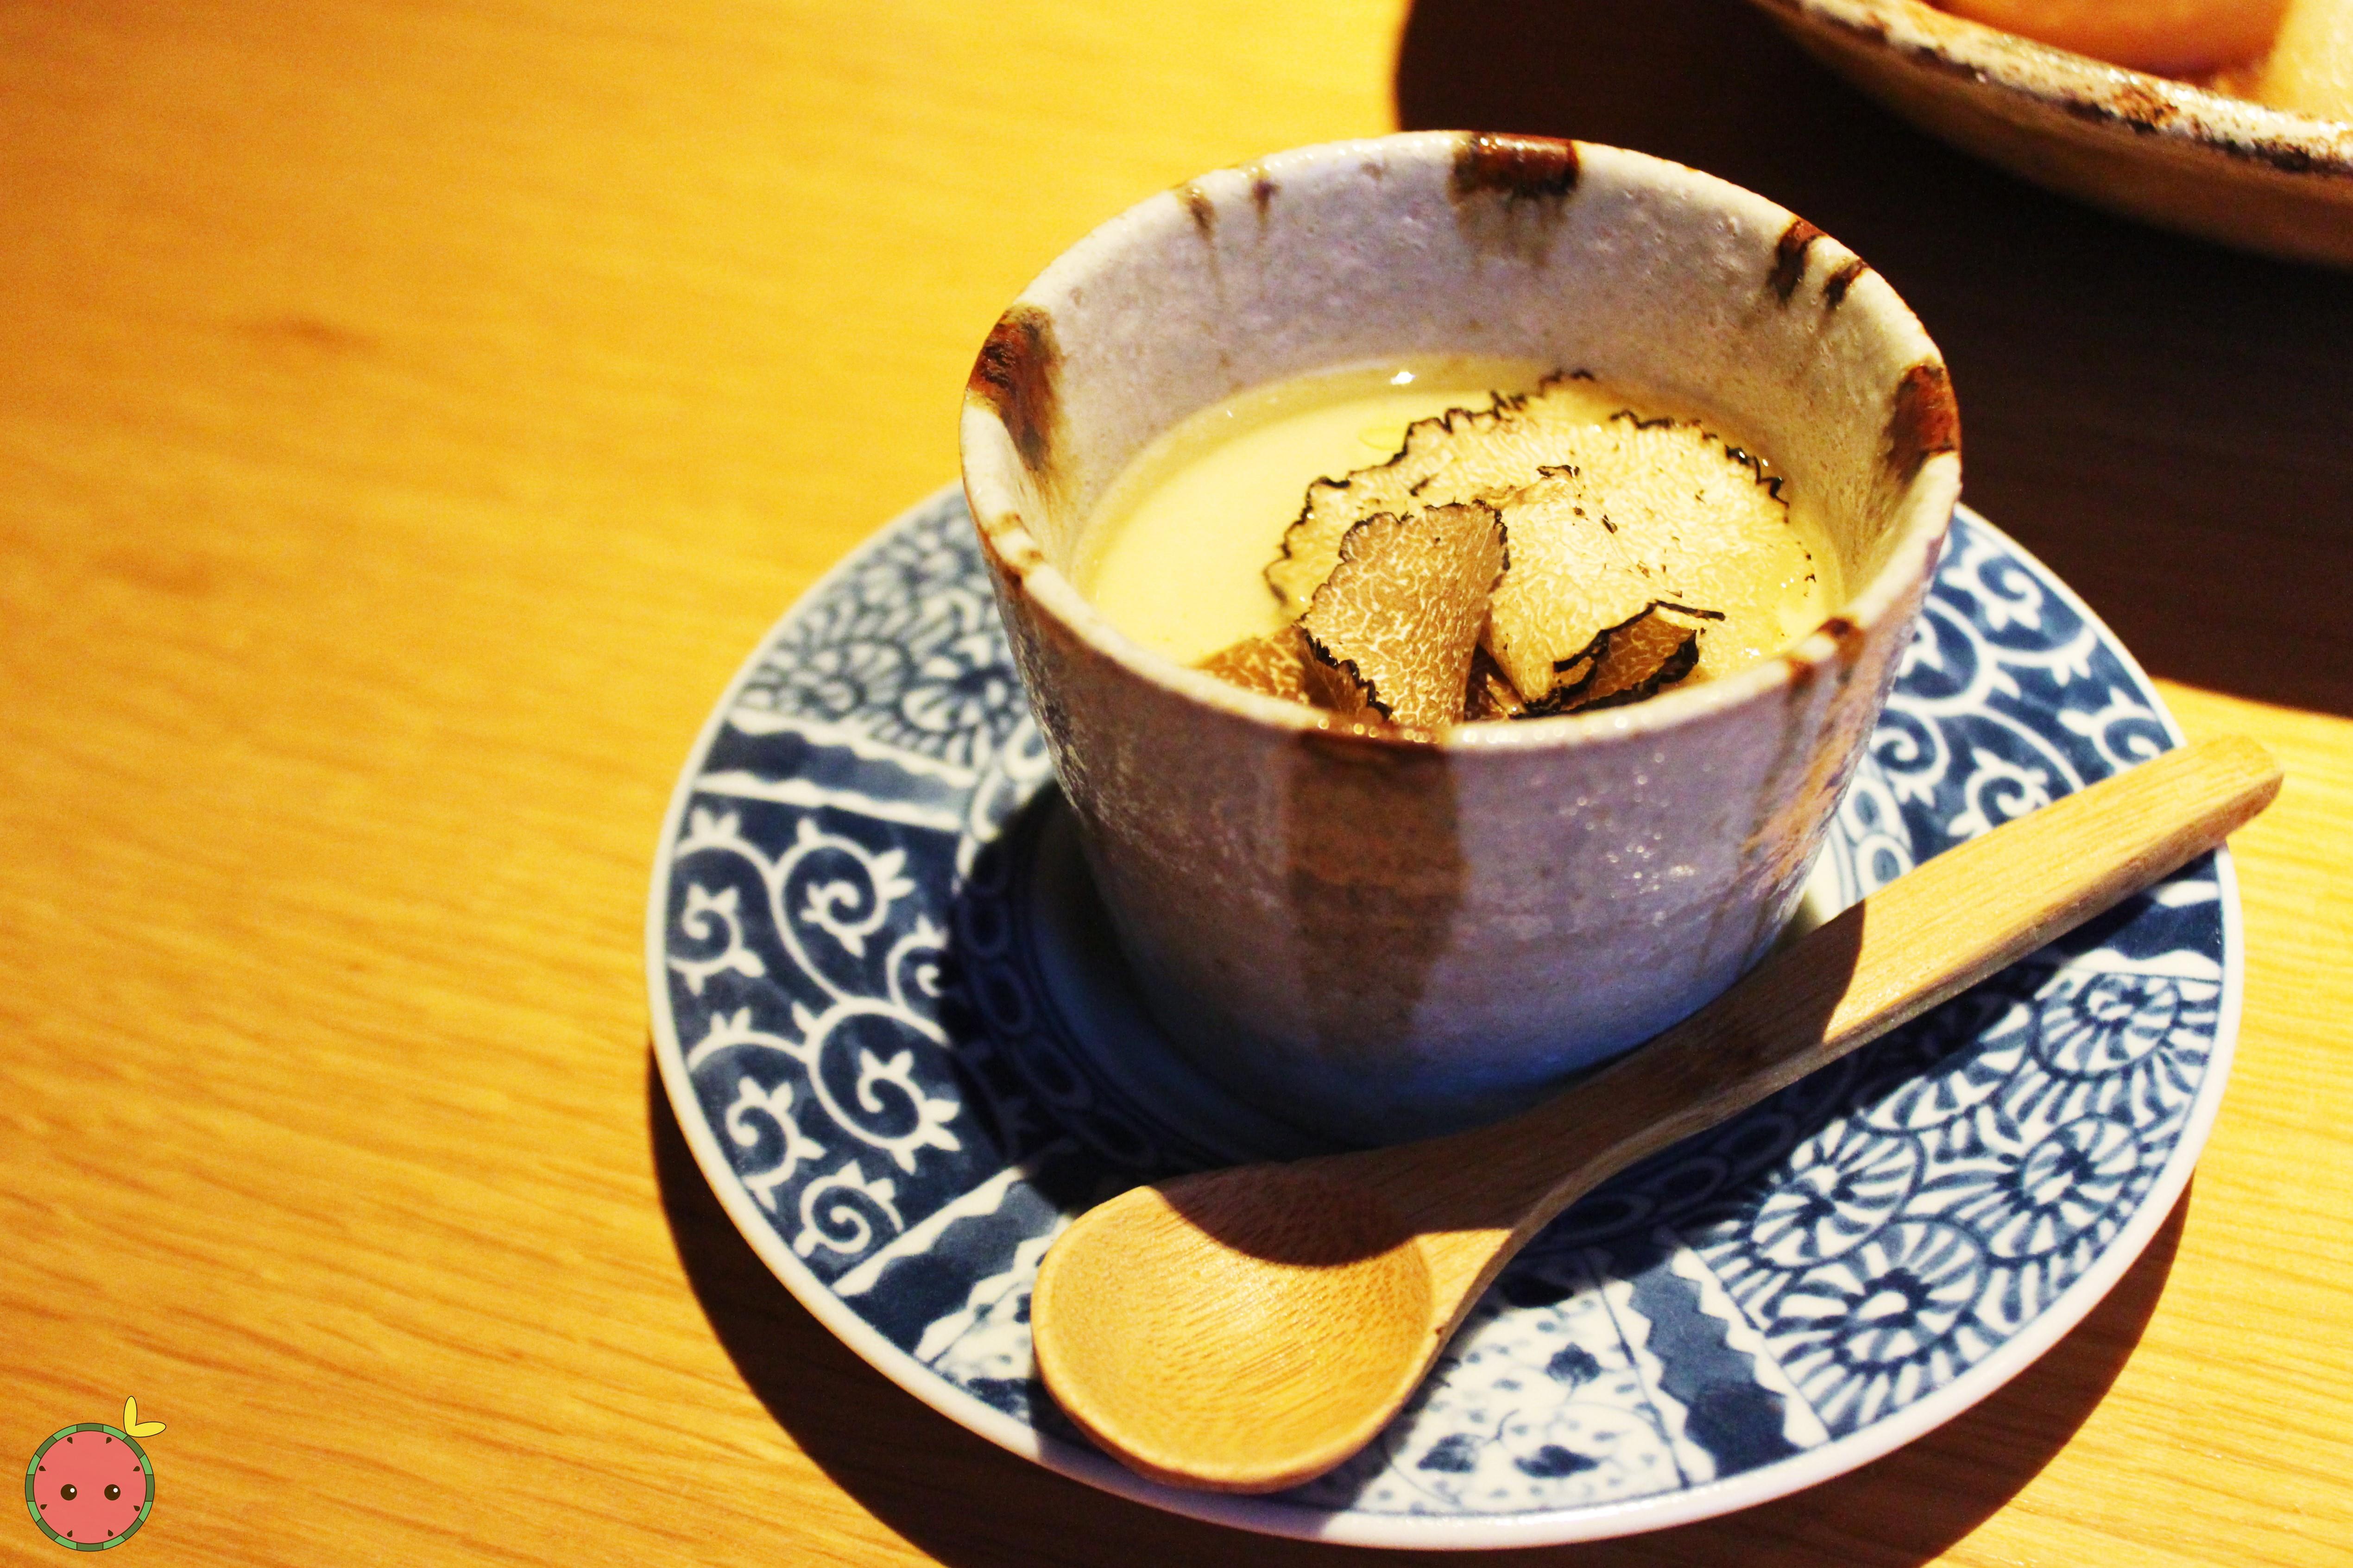 Black truffle chawanmushi with shaved black truffles